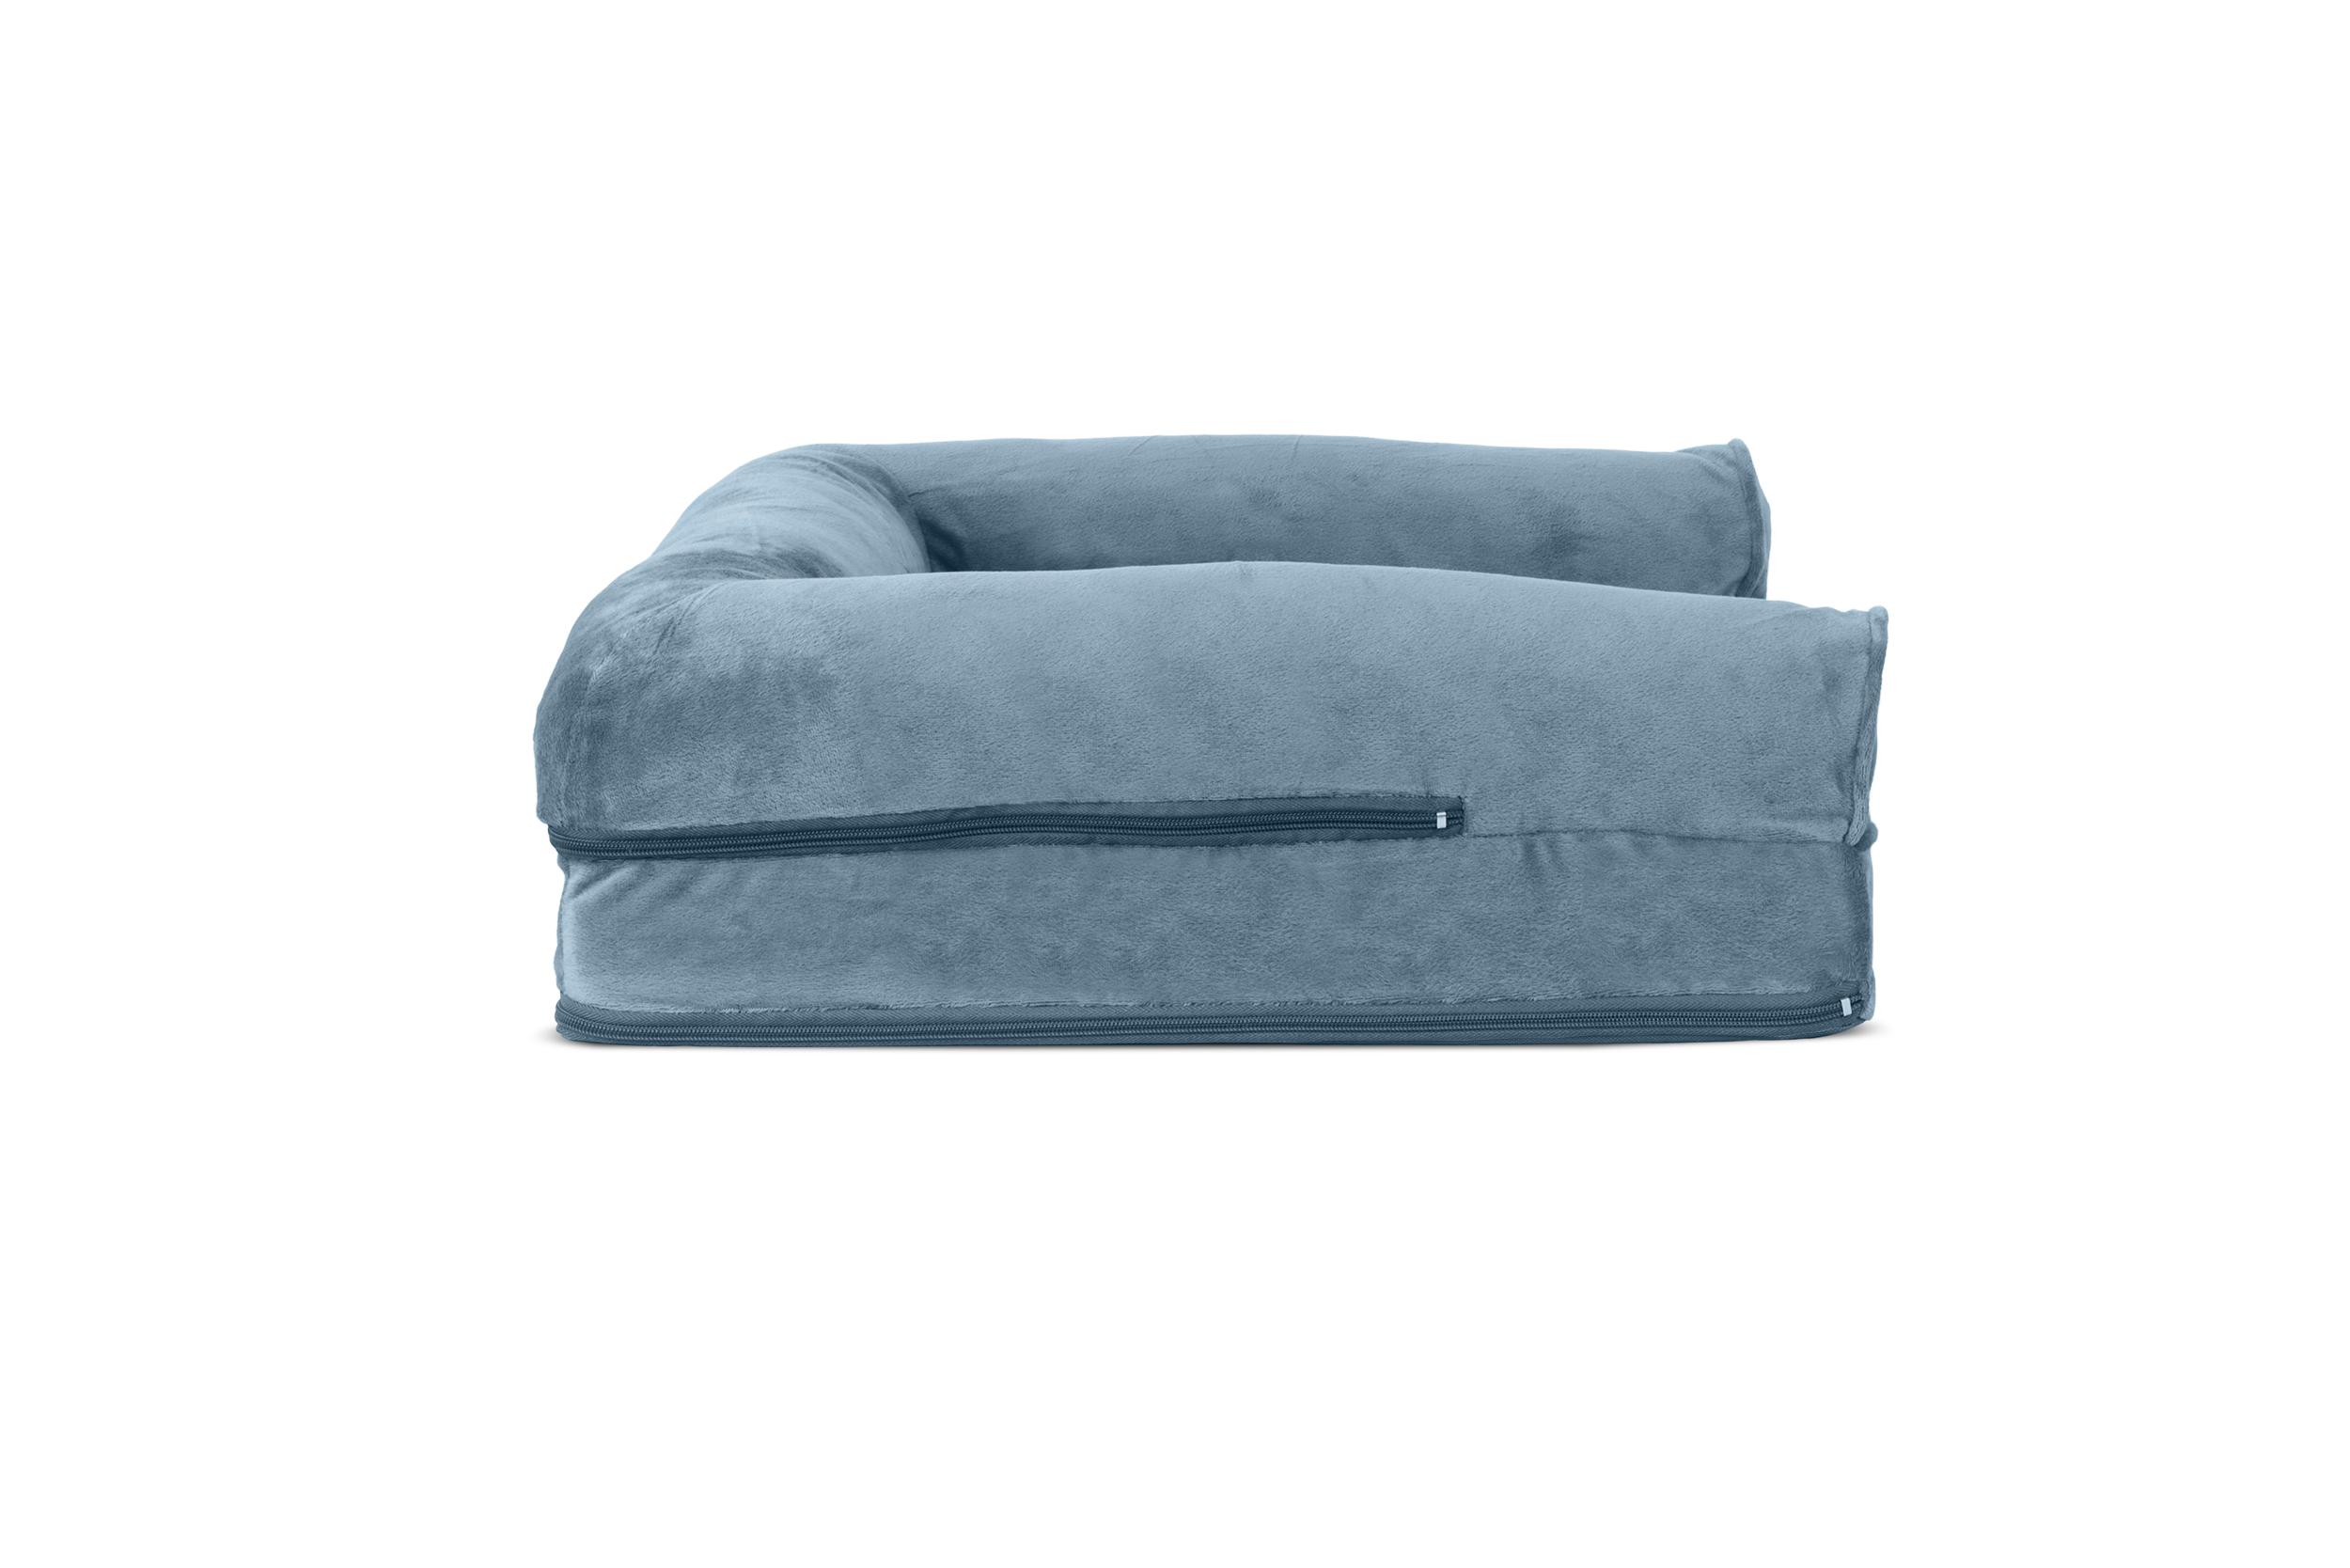 orthopedic sofa cincinnati faux fur and velvet pet bed dog couch ebay